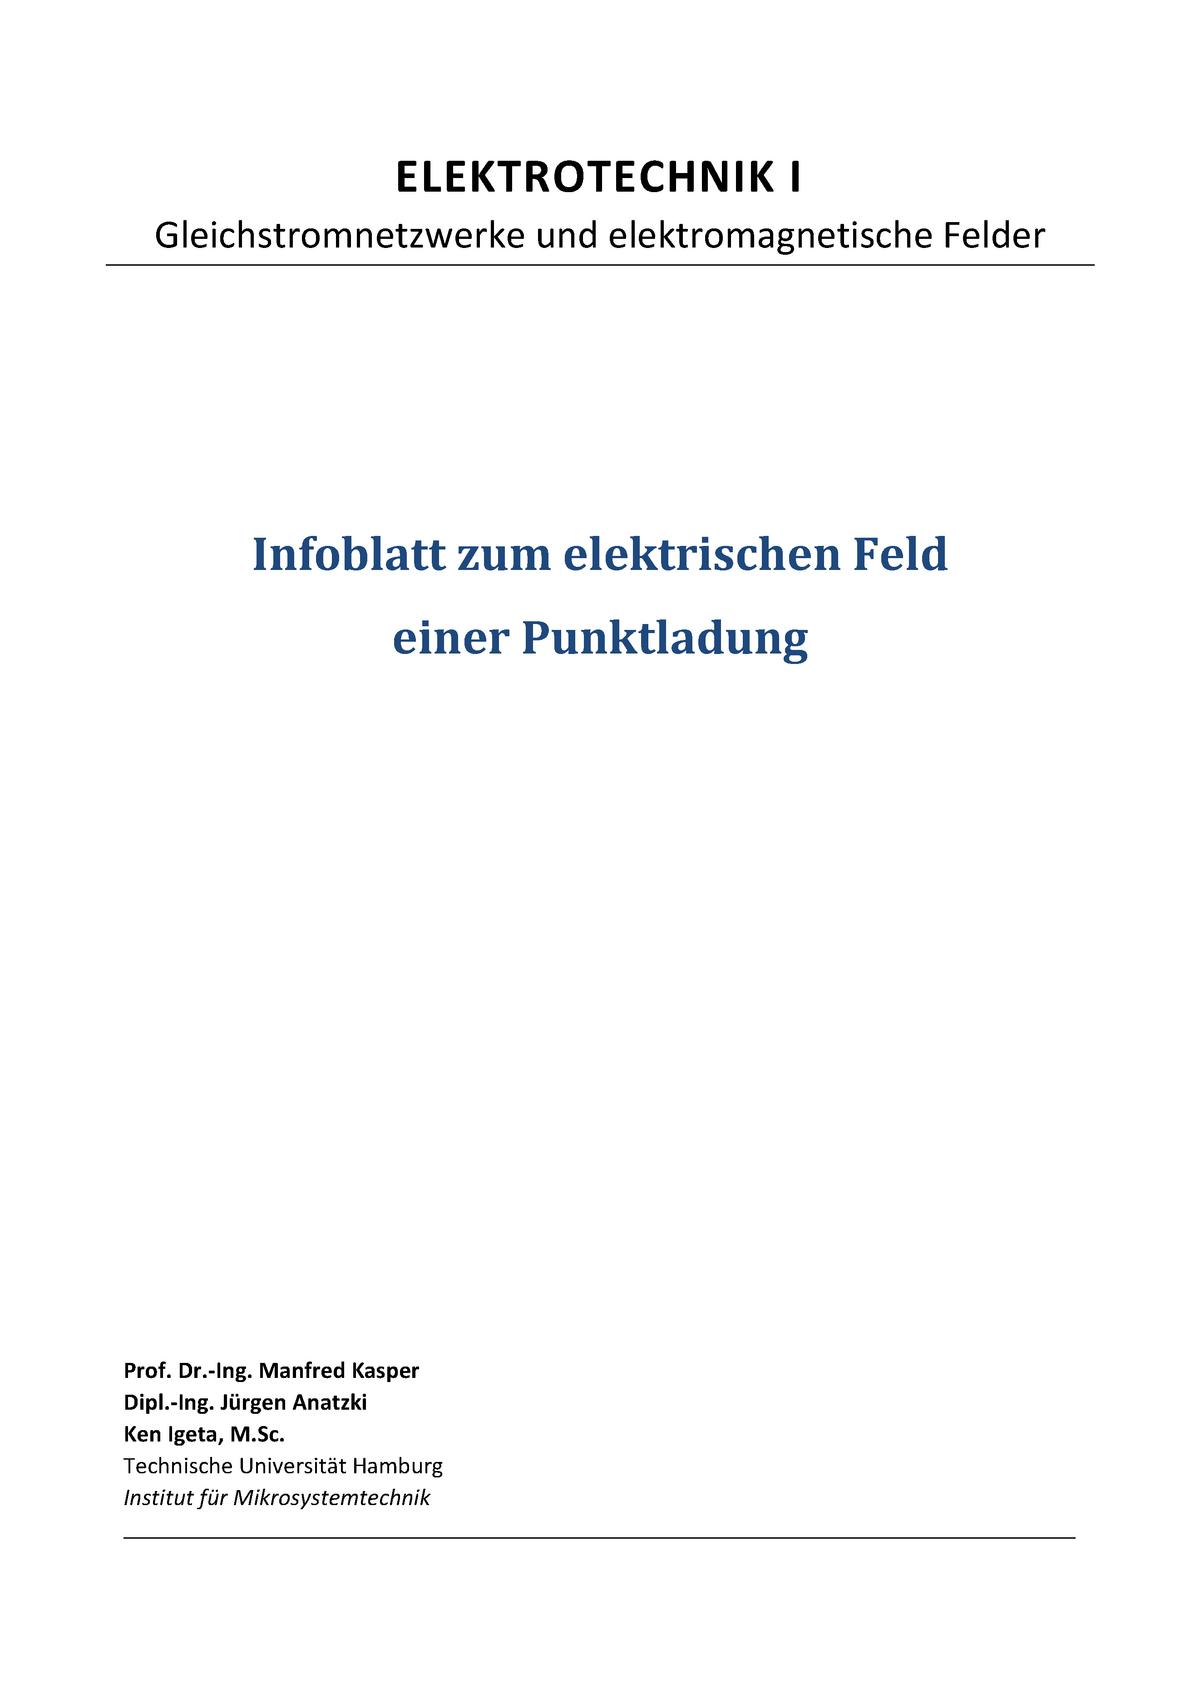 Tuhh Et1 Infoblatt U07 Elektrisches Feld Tu Hamburg Studocu